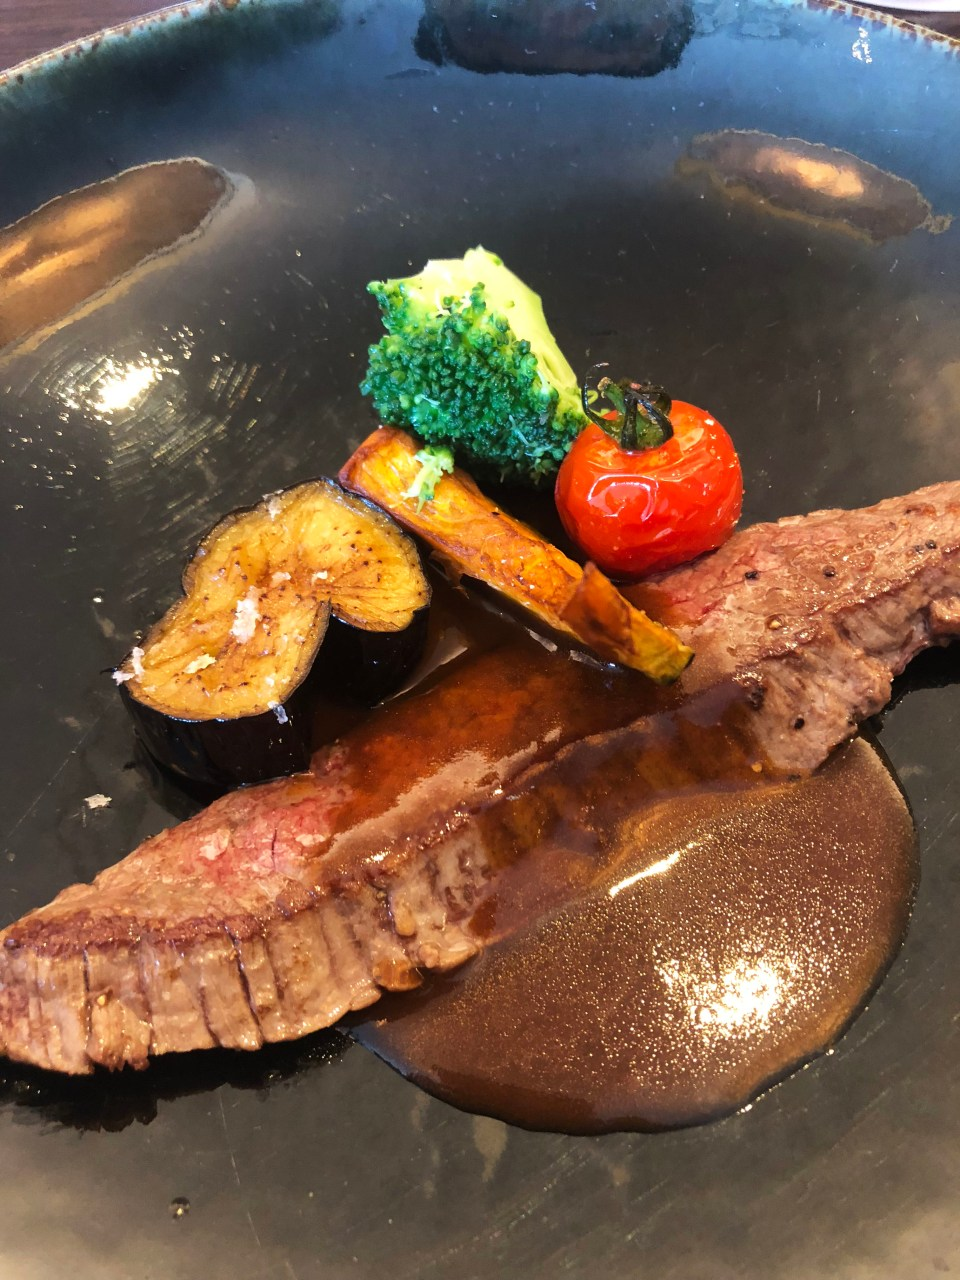 Steak + Vegetables